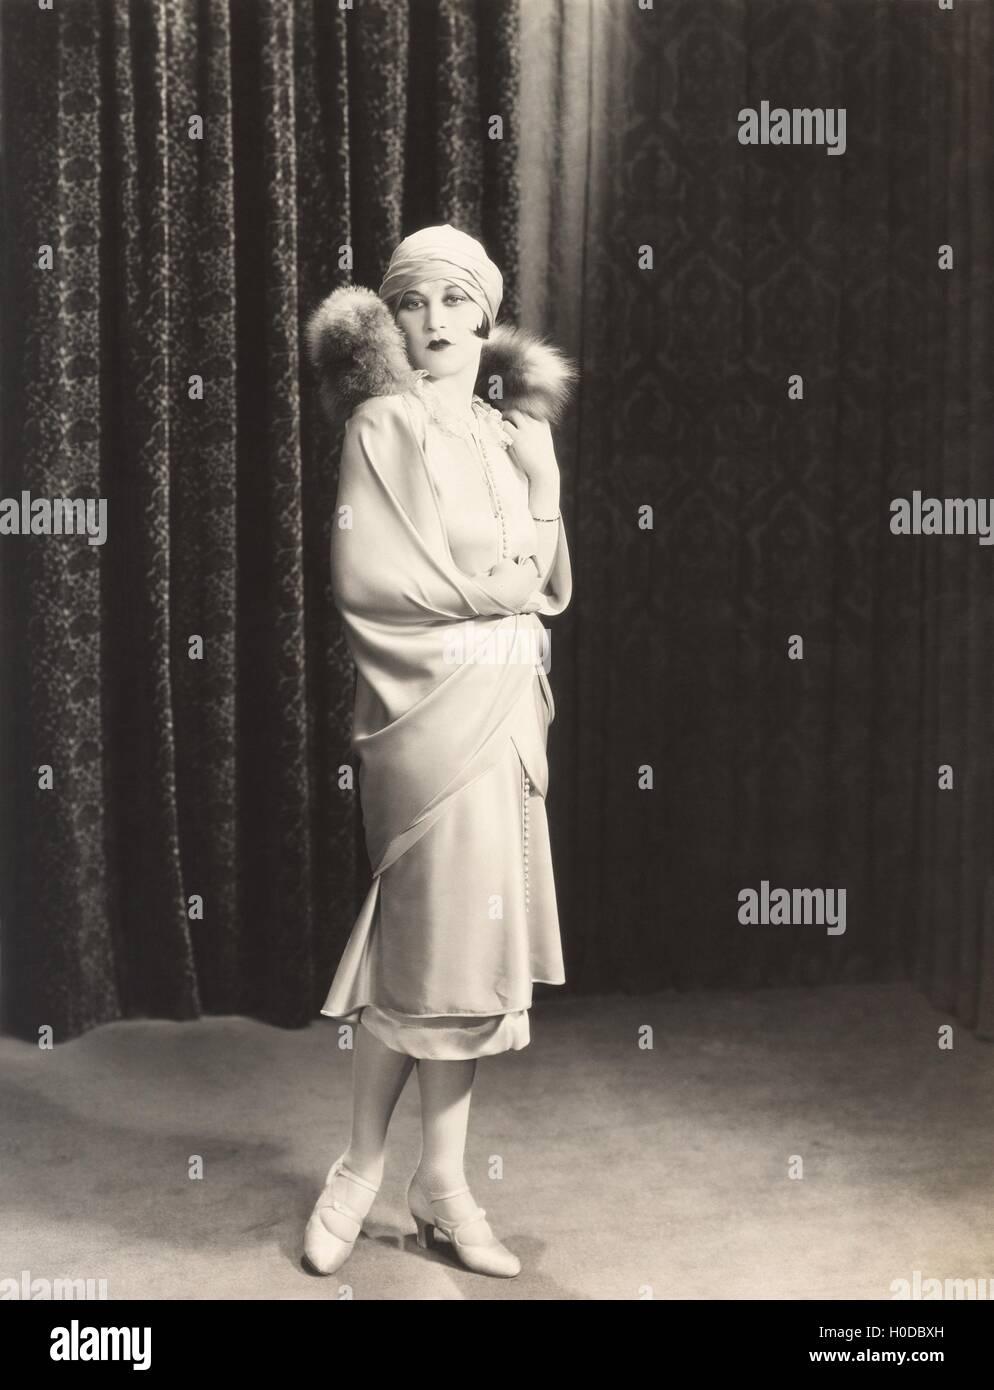 1920s chic - Stock Image